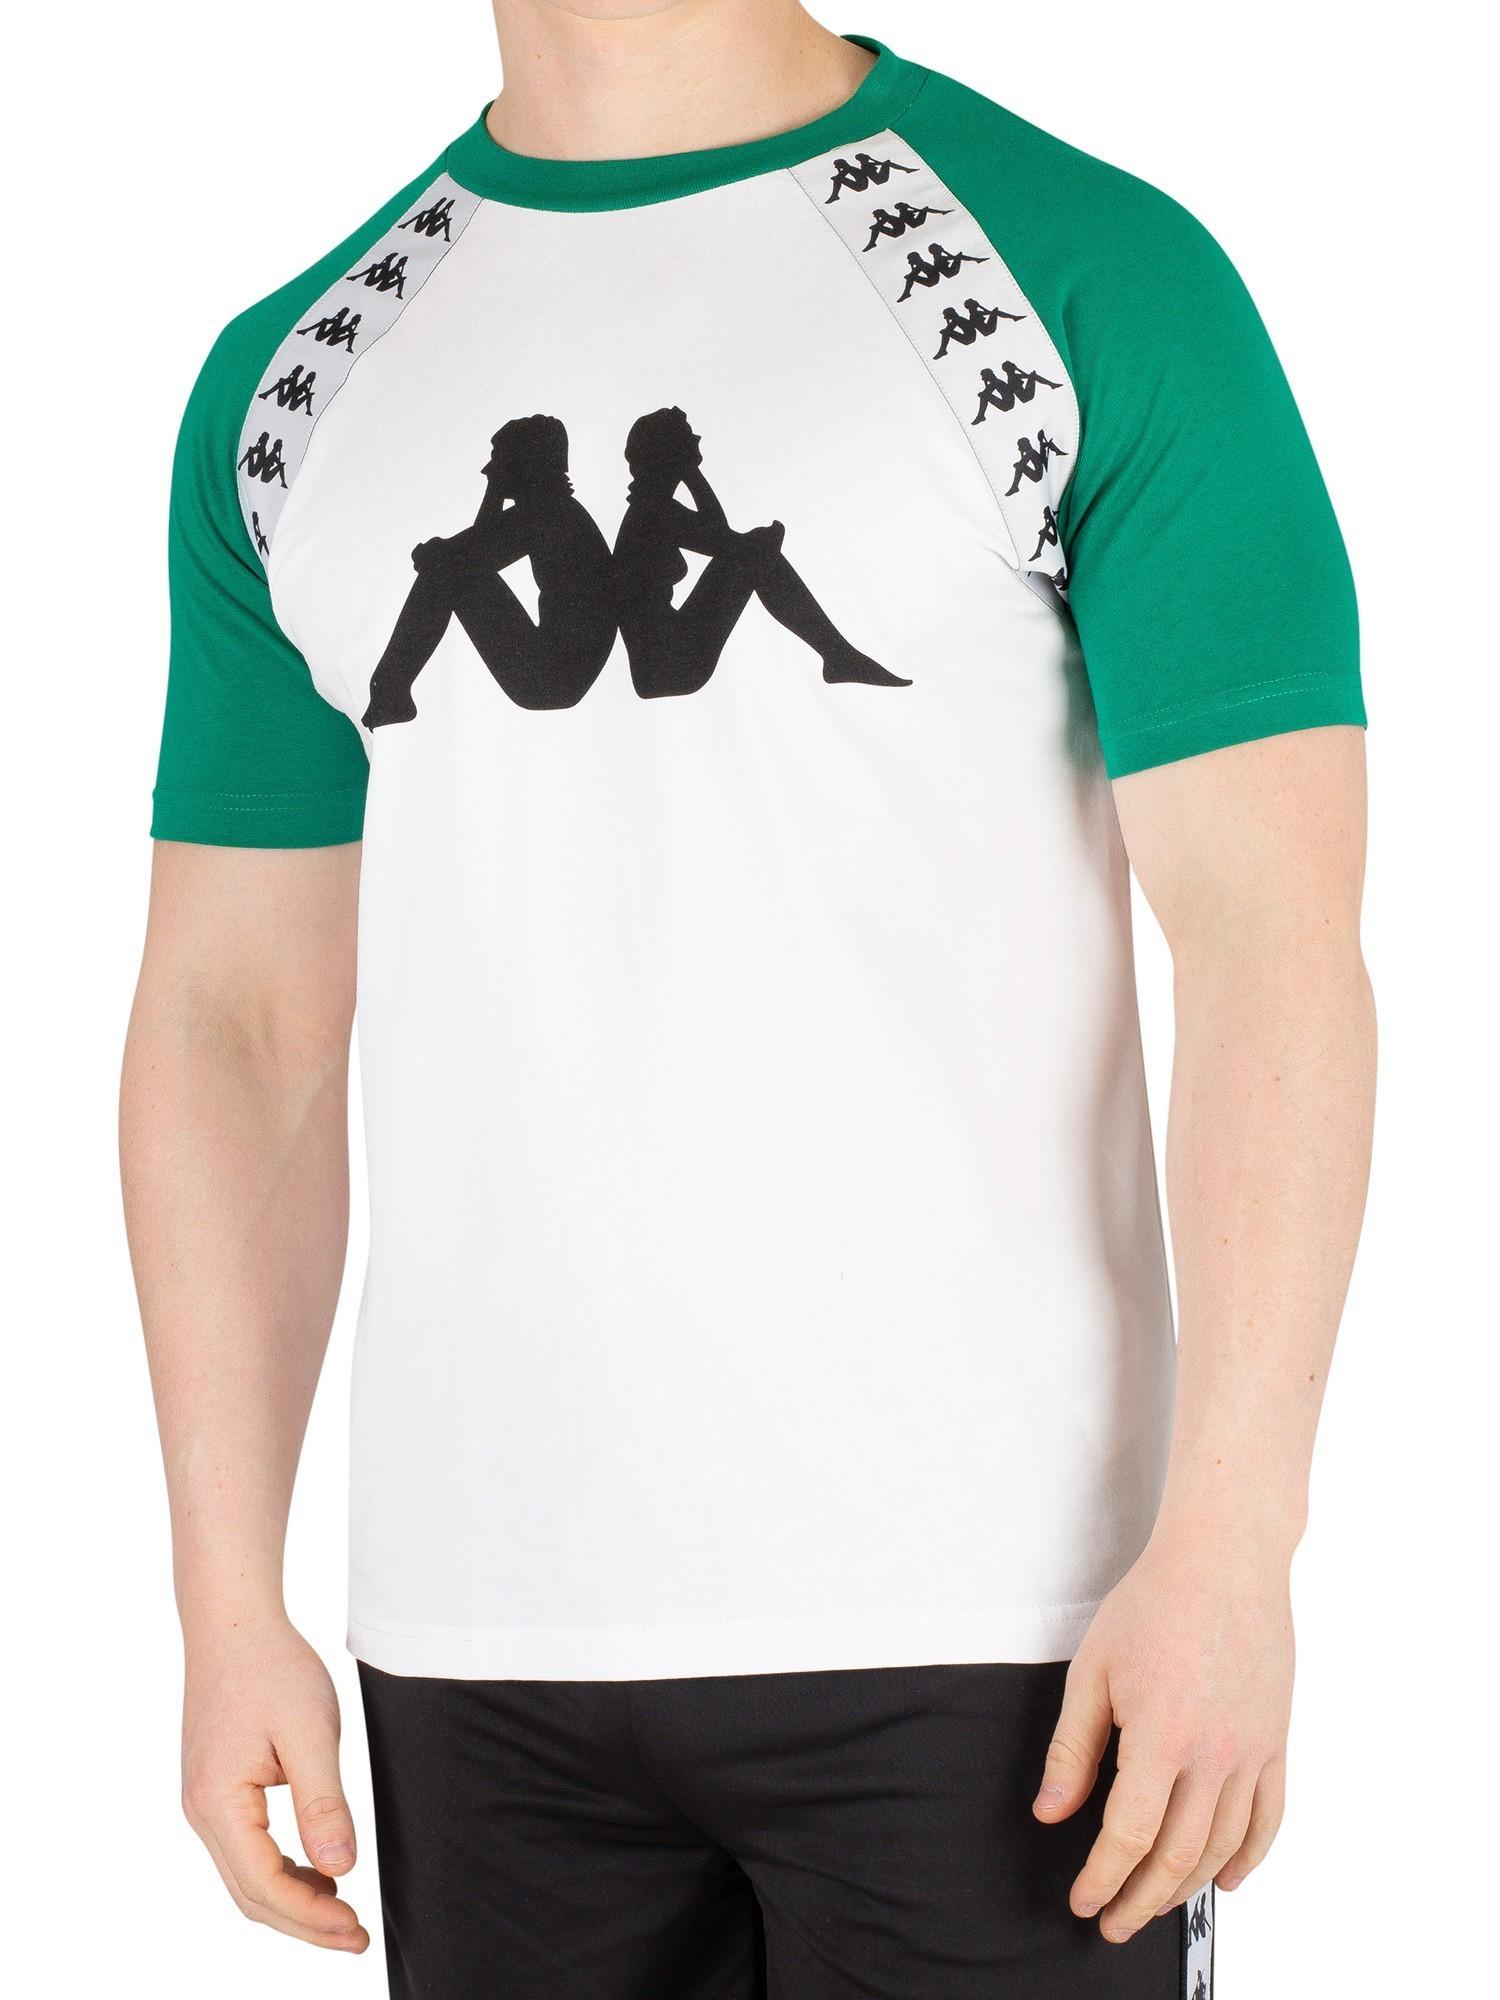 buy online 24c5d 210bc Kappa Banda Bardi T-Shirt - White/Green